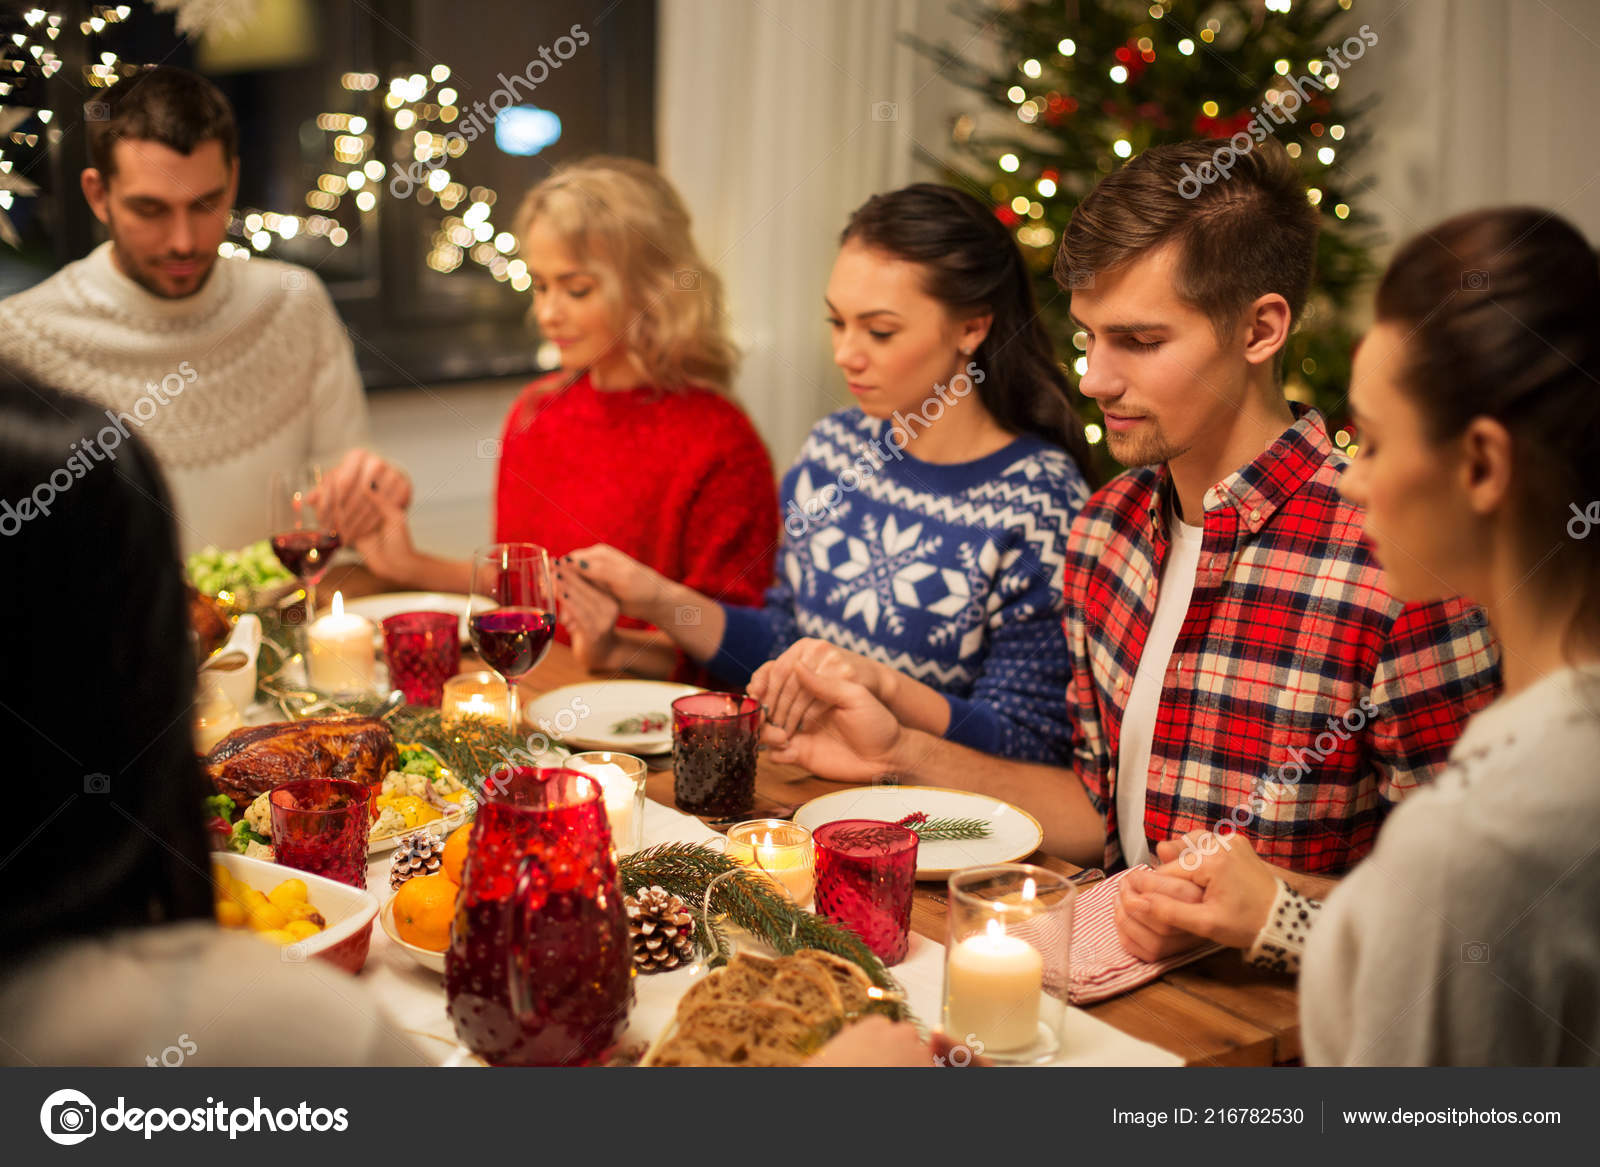 Fotos Cena Navidad Frinsa.Friends Having Home Christmas Dinner And Praying Stock